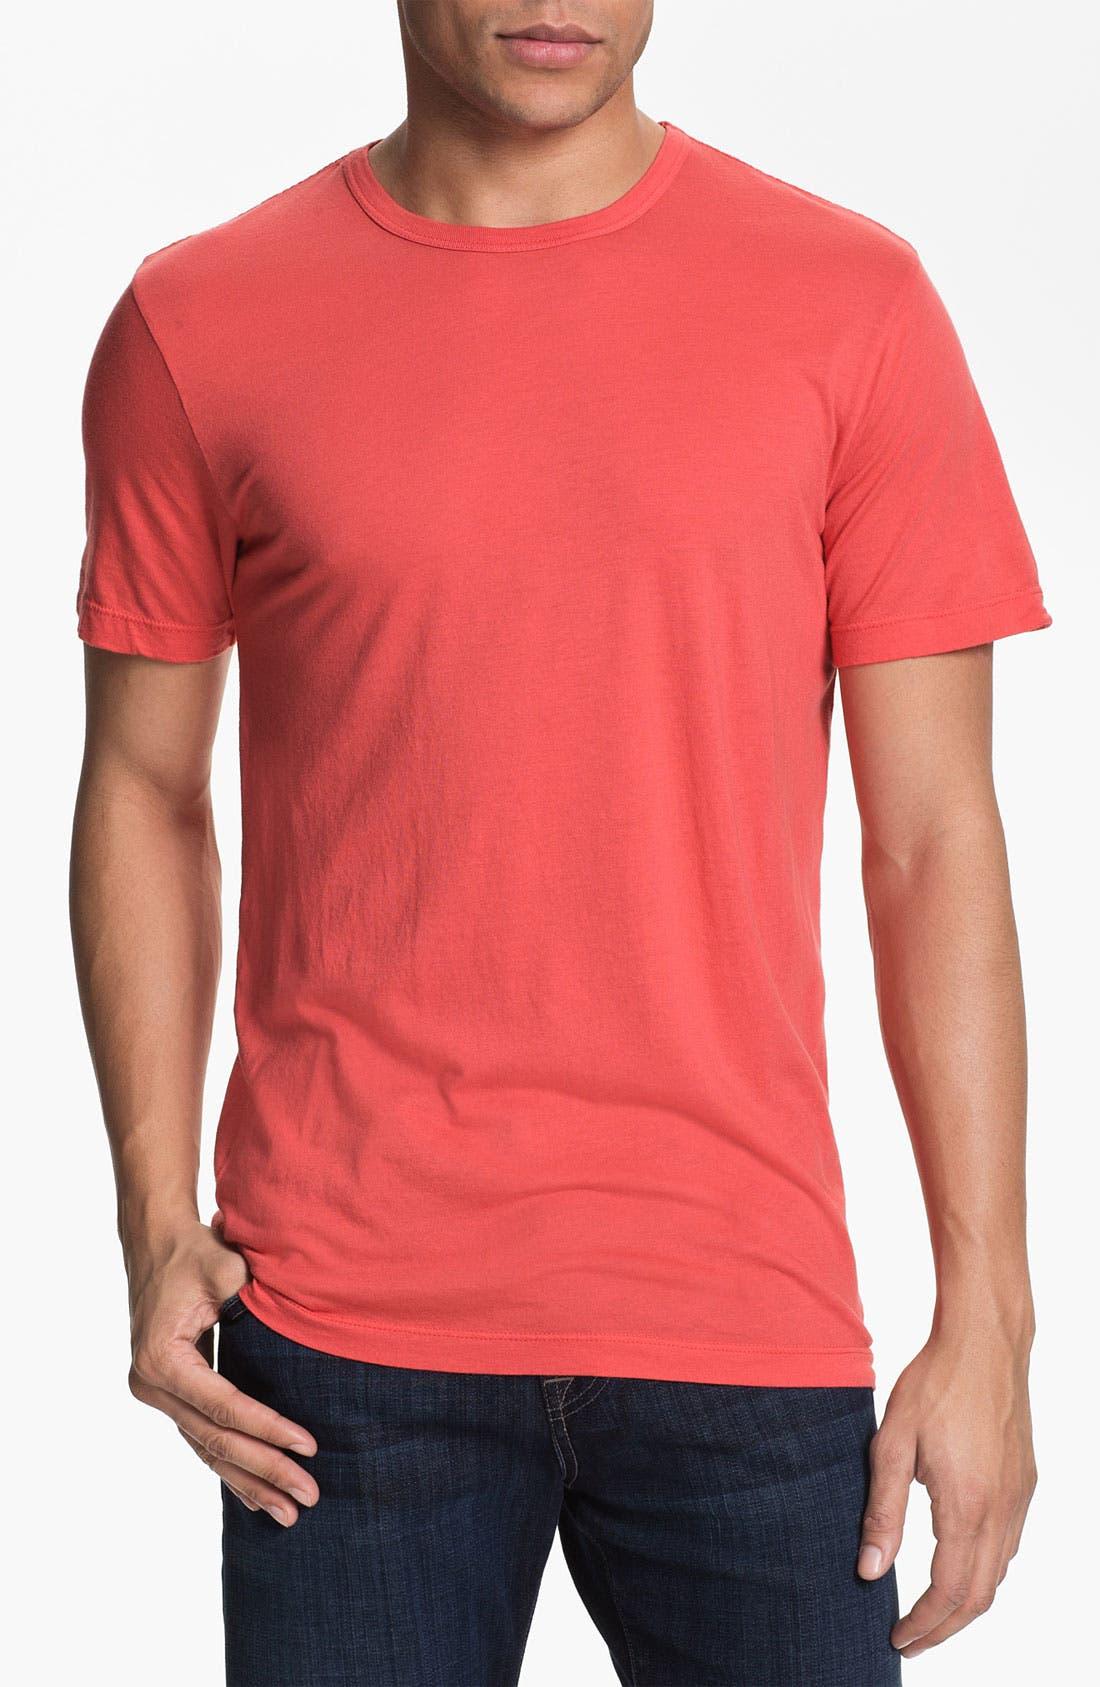 Main Image - Splendid Mills 'Always' Crewneck T-Shirt